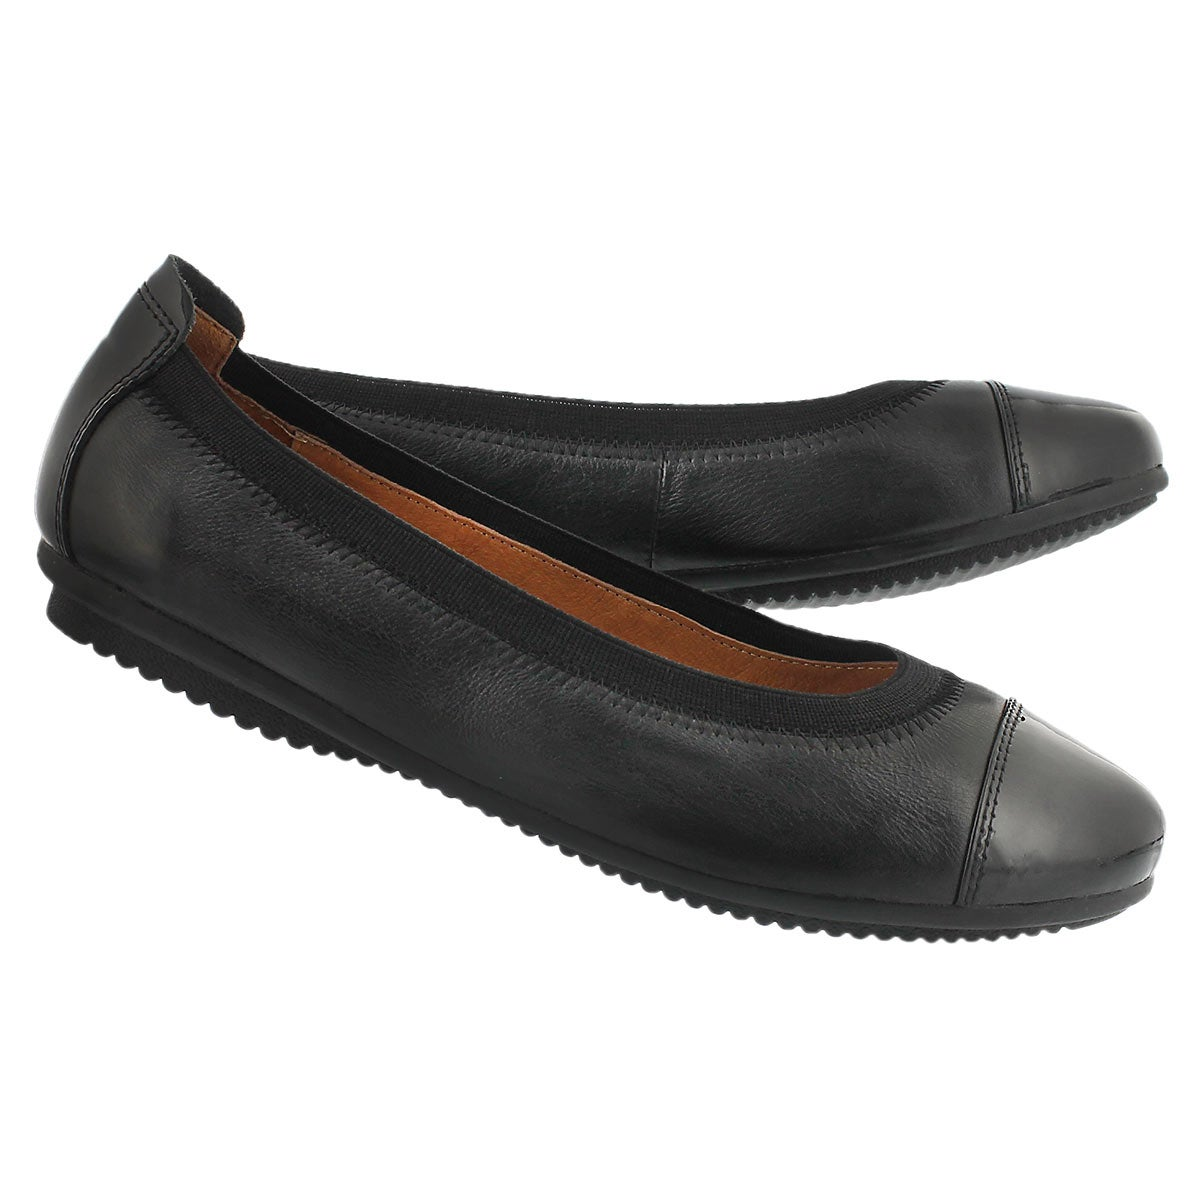 Ballerine Pippa 07, cuir noir, femmes